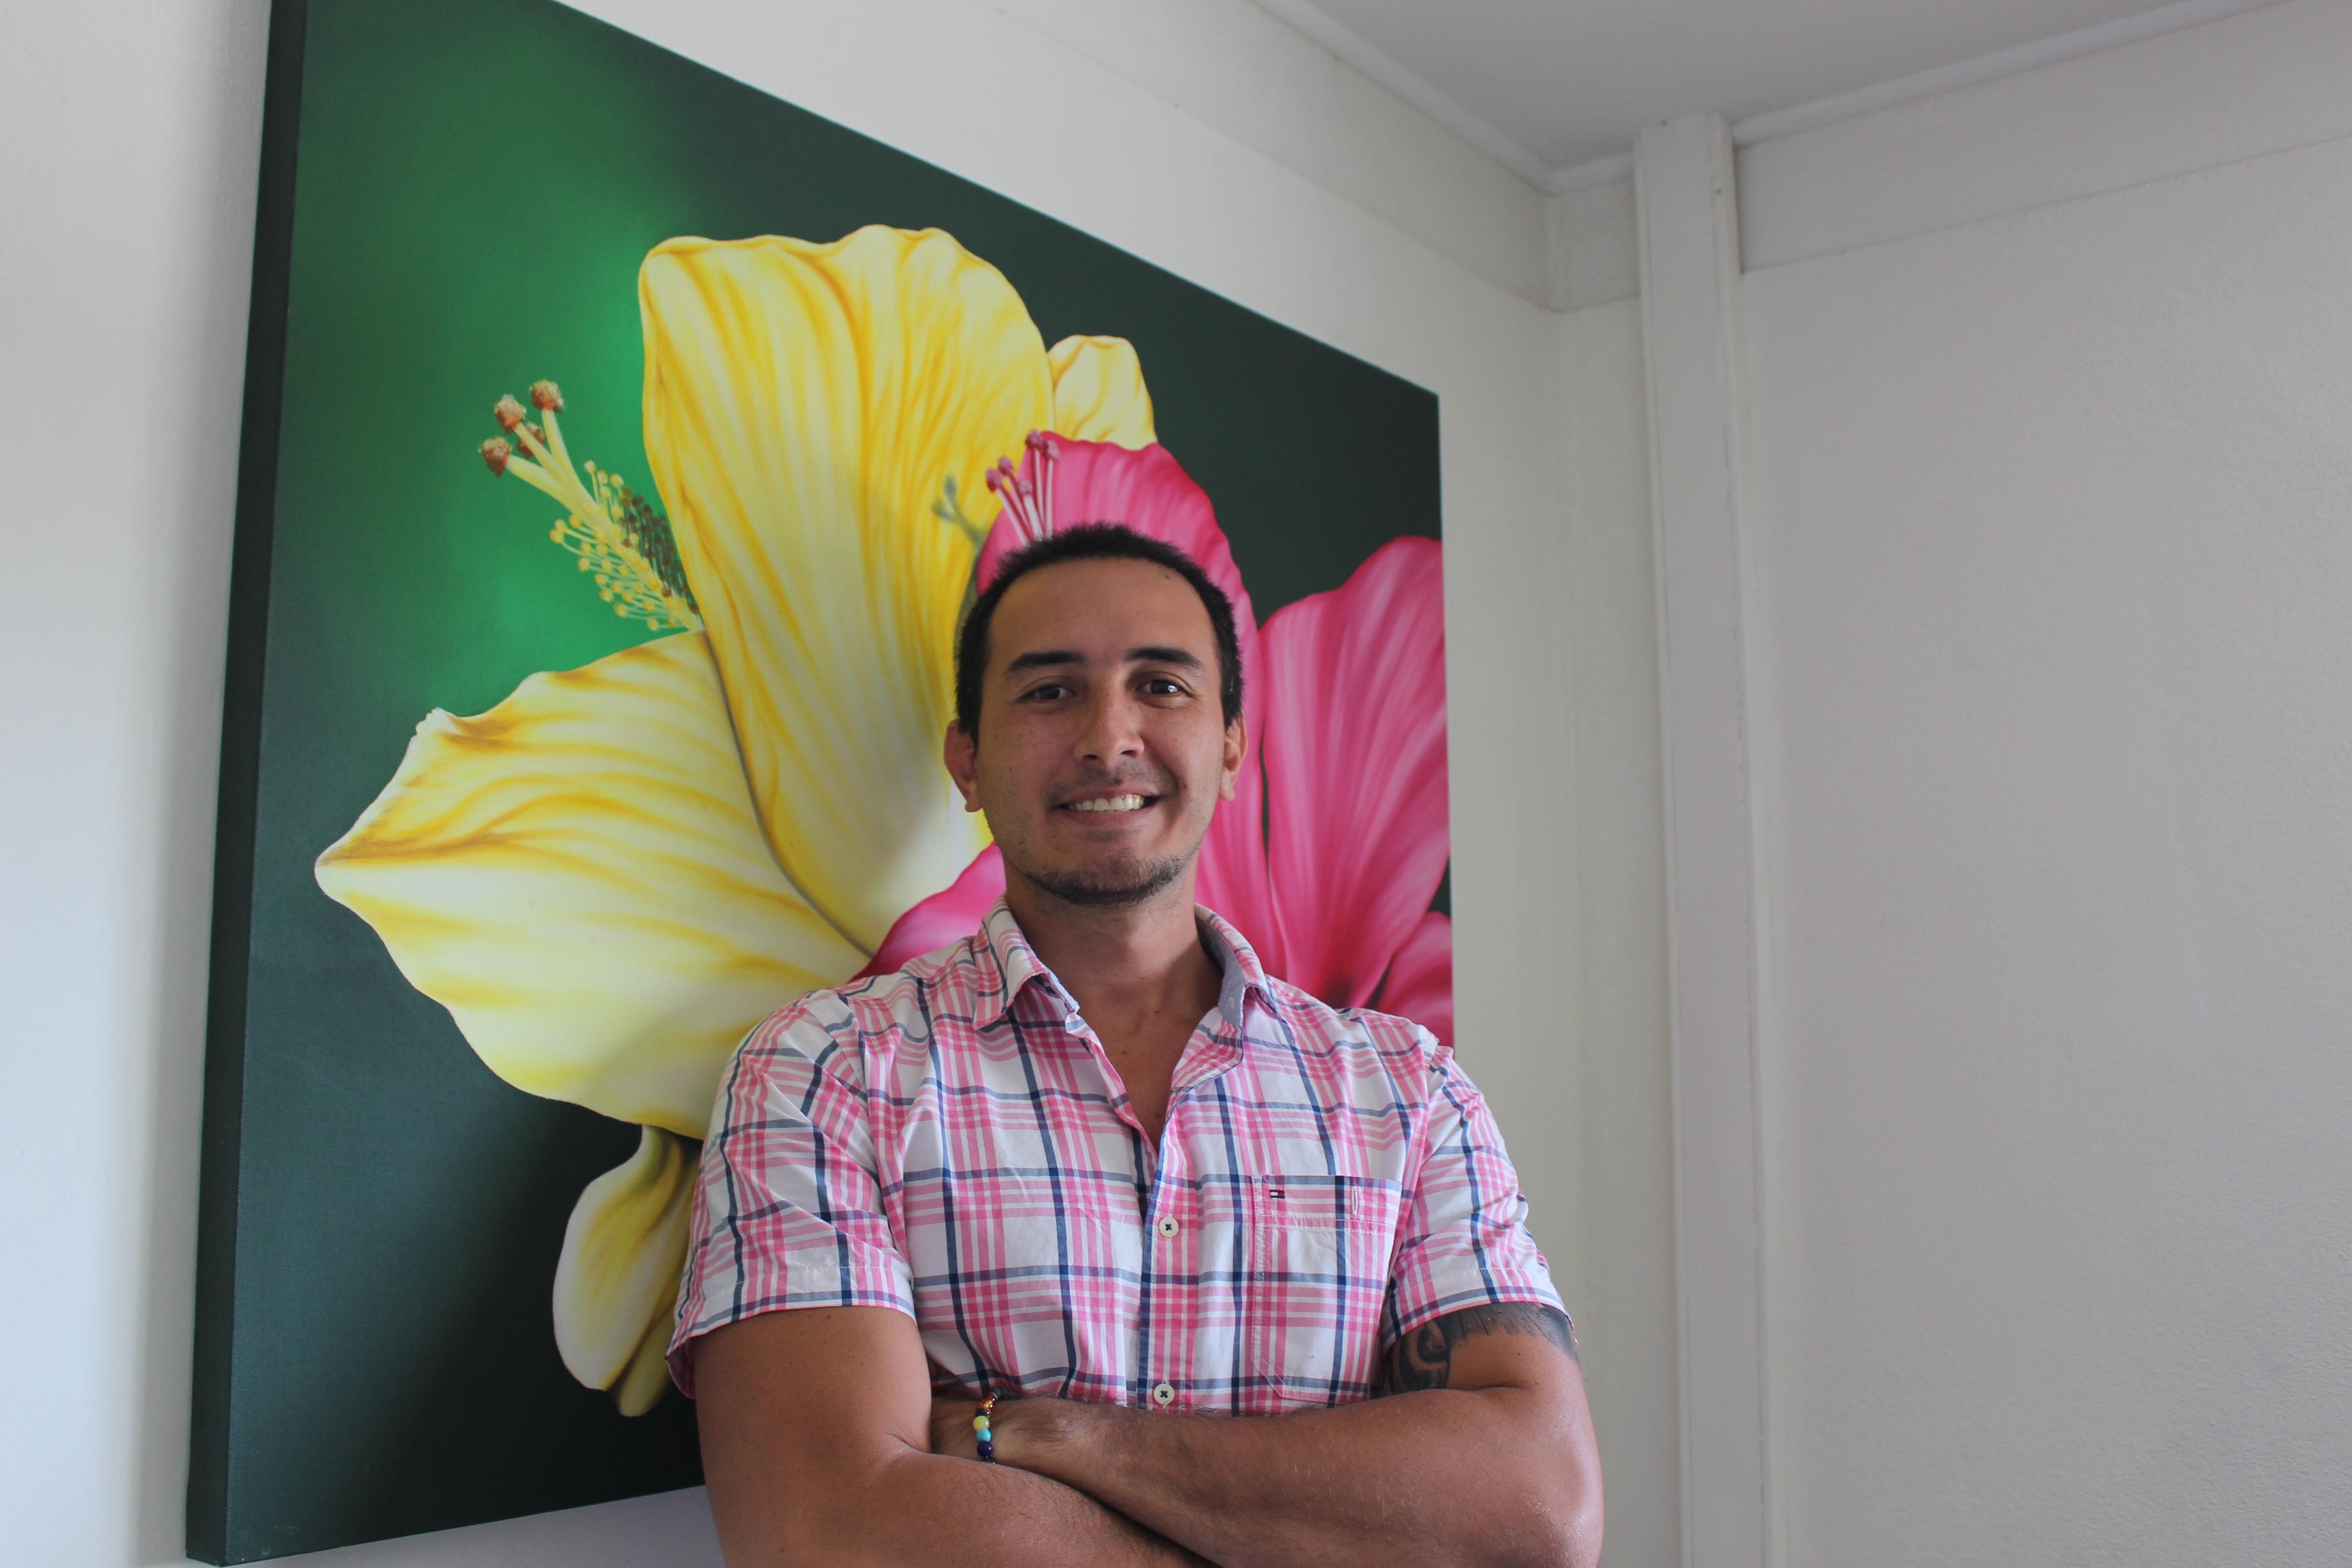 Geoffrey Van der Maessen du collectif Nana sac plastique participera au meeting de Green Polynesian le 2 juin.